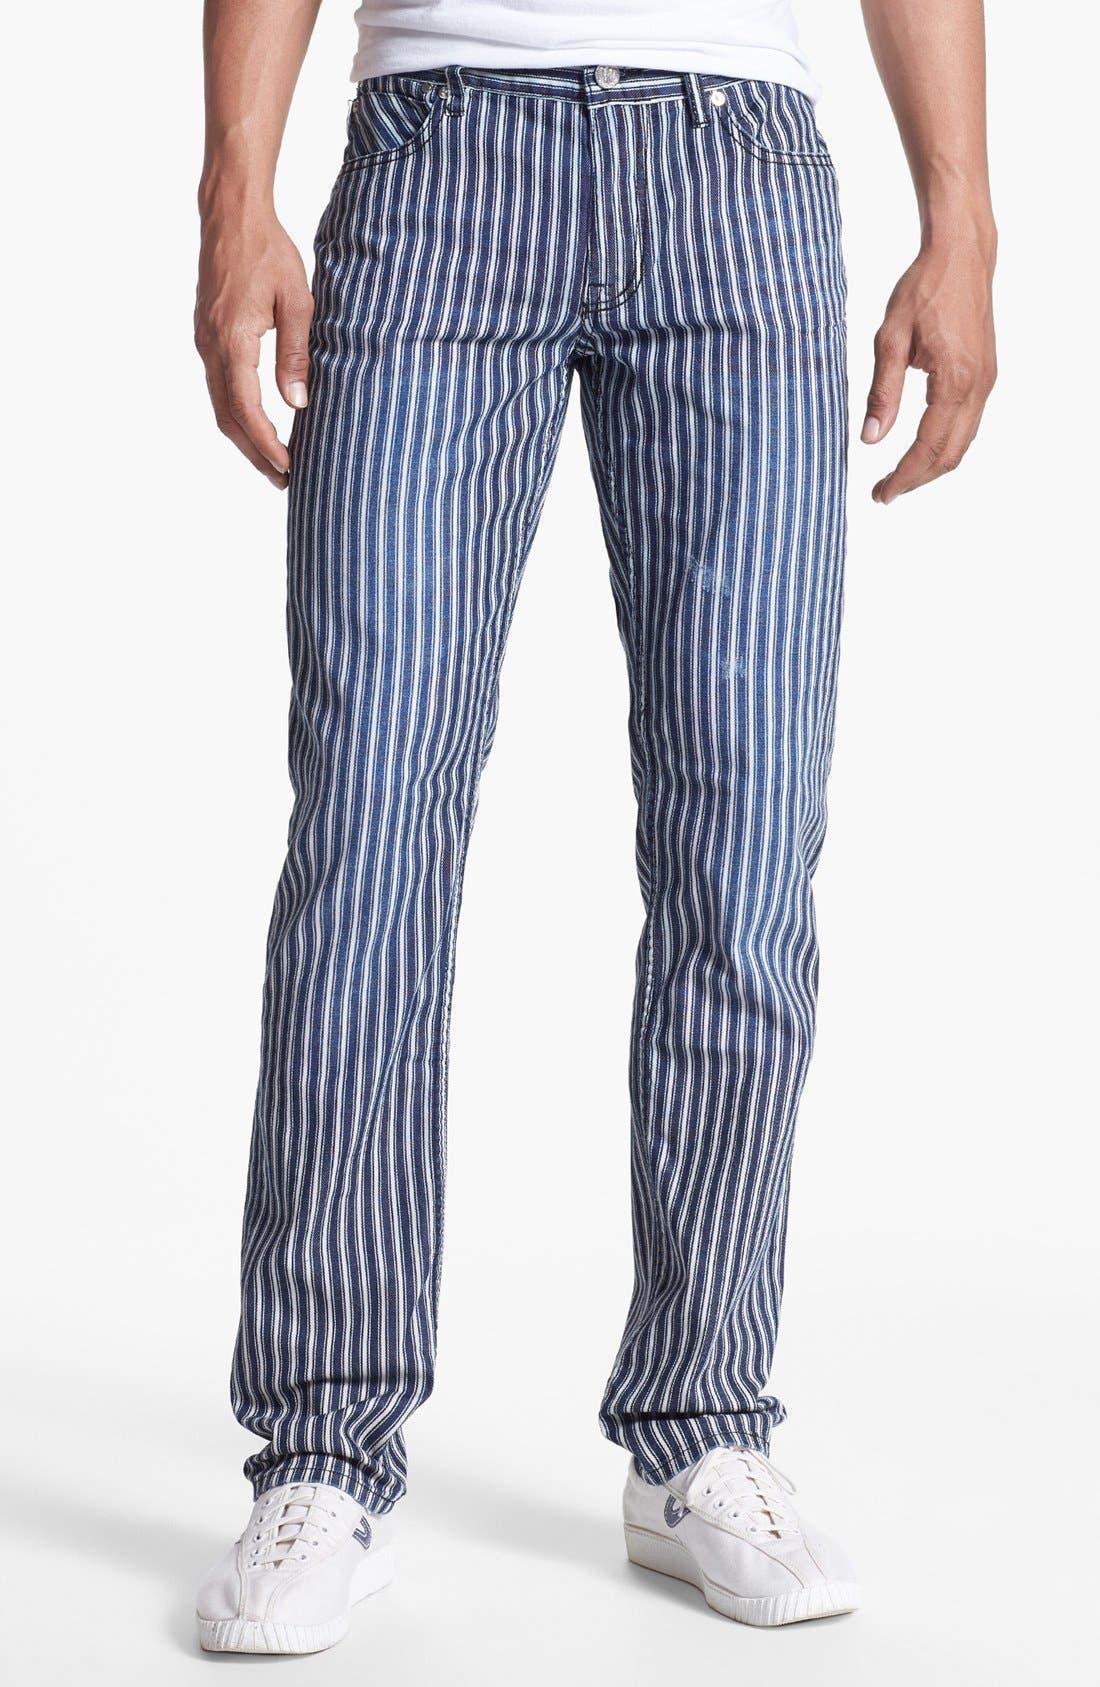 Alternate Image 1 Selected - Williamsburg Garment Company 'Grand Street' Slim Fit Jeans (Engineer Stripe)